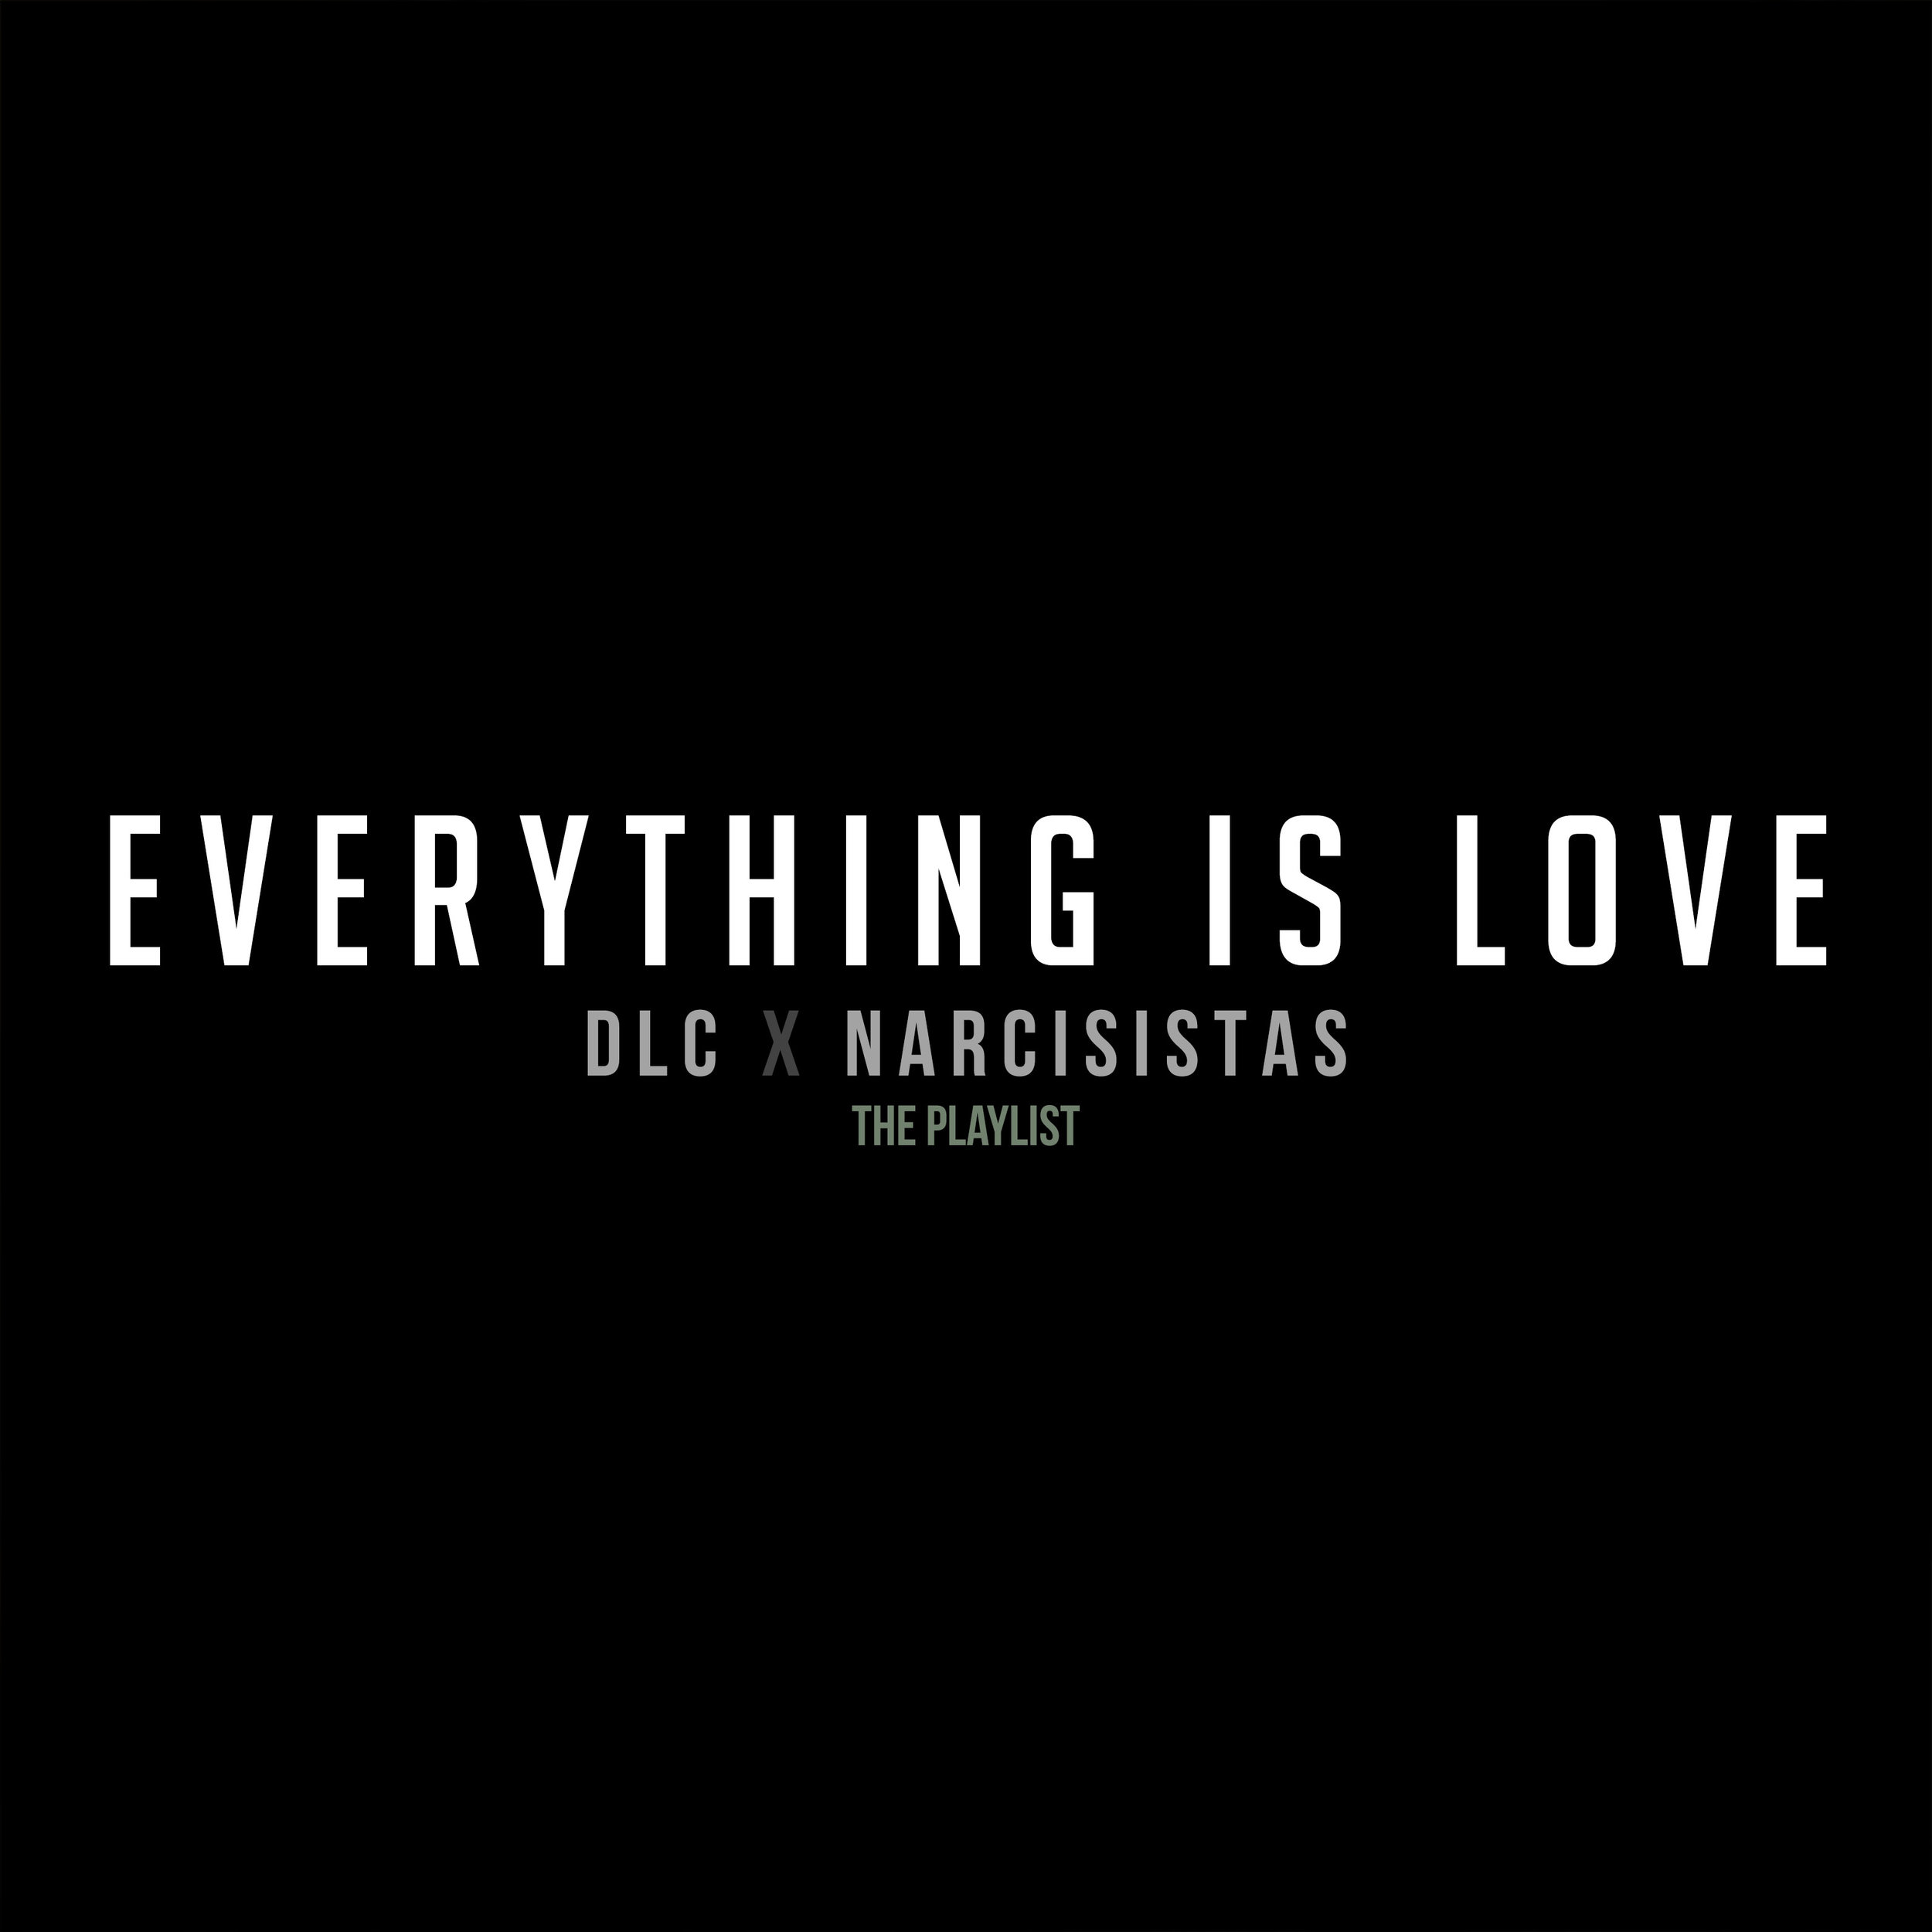 EVERYTHING IS LOVE PLAYLIST1.jpg